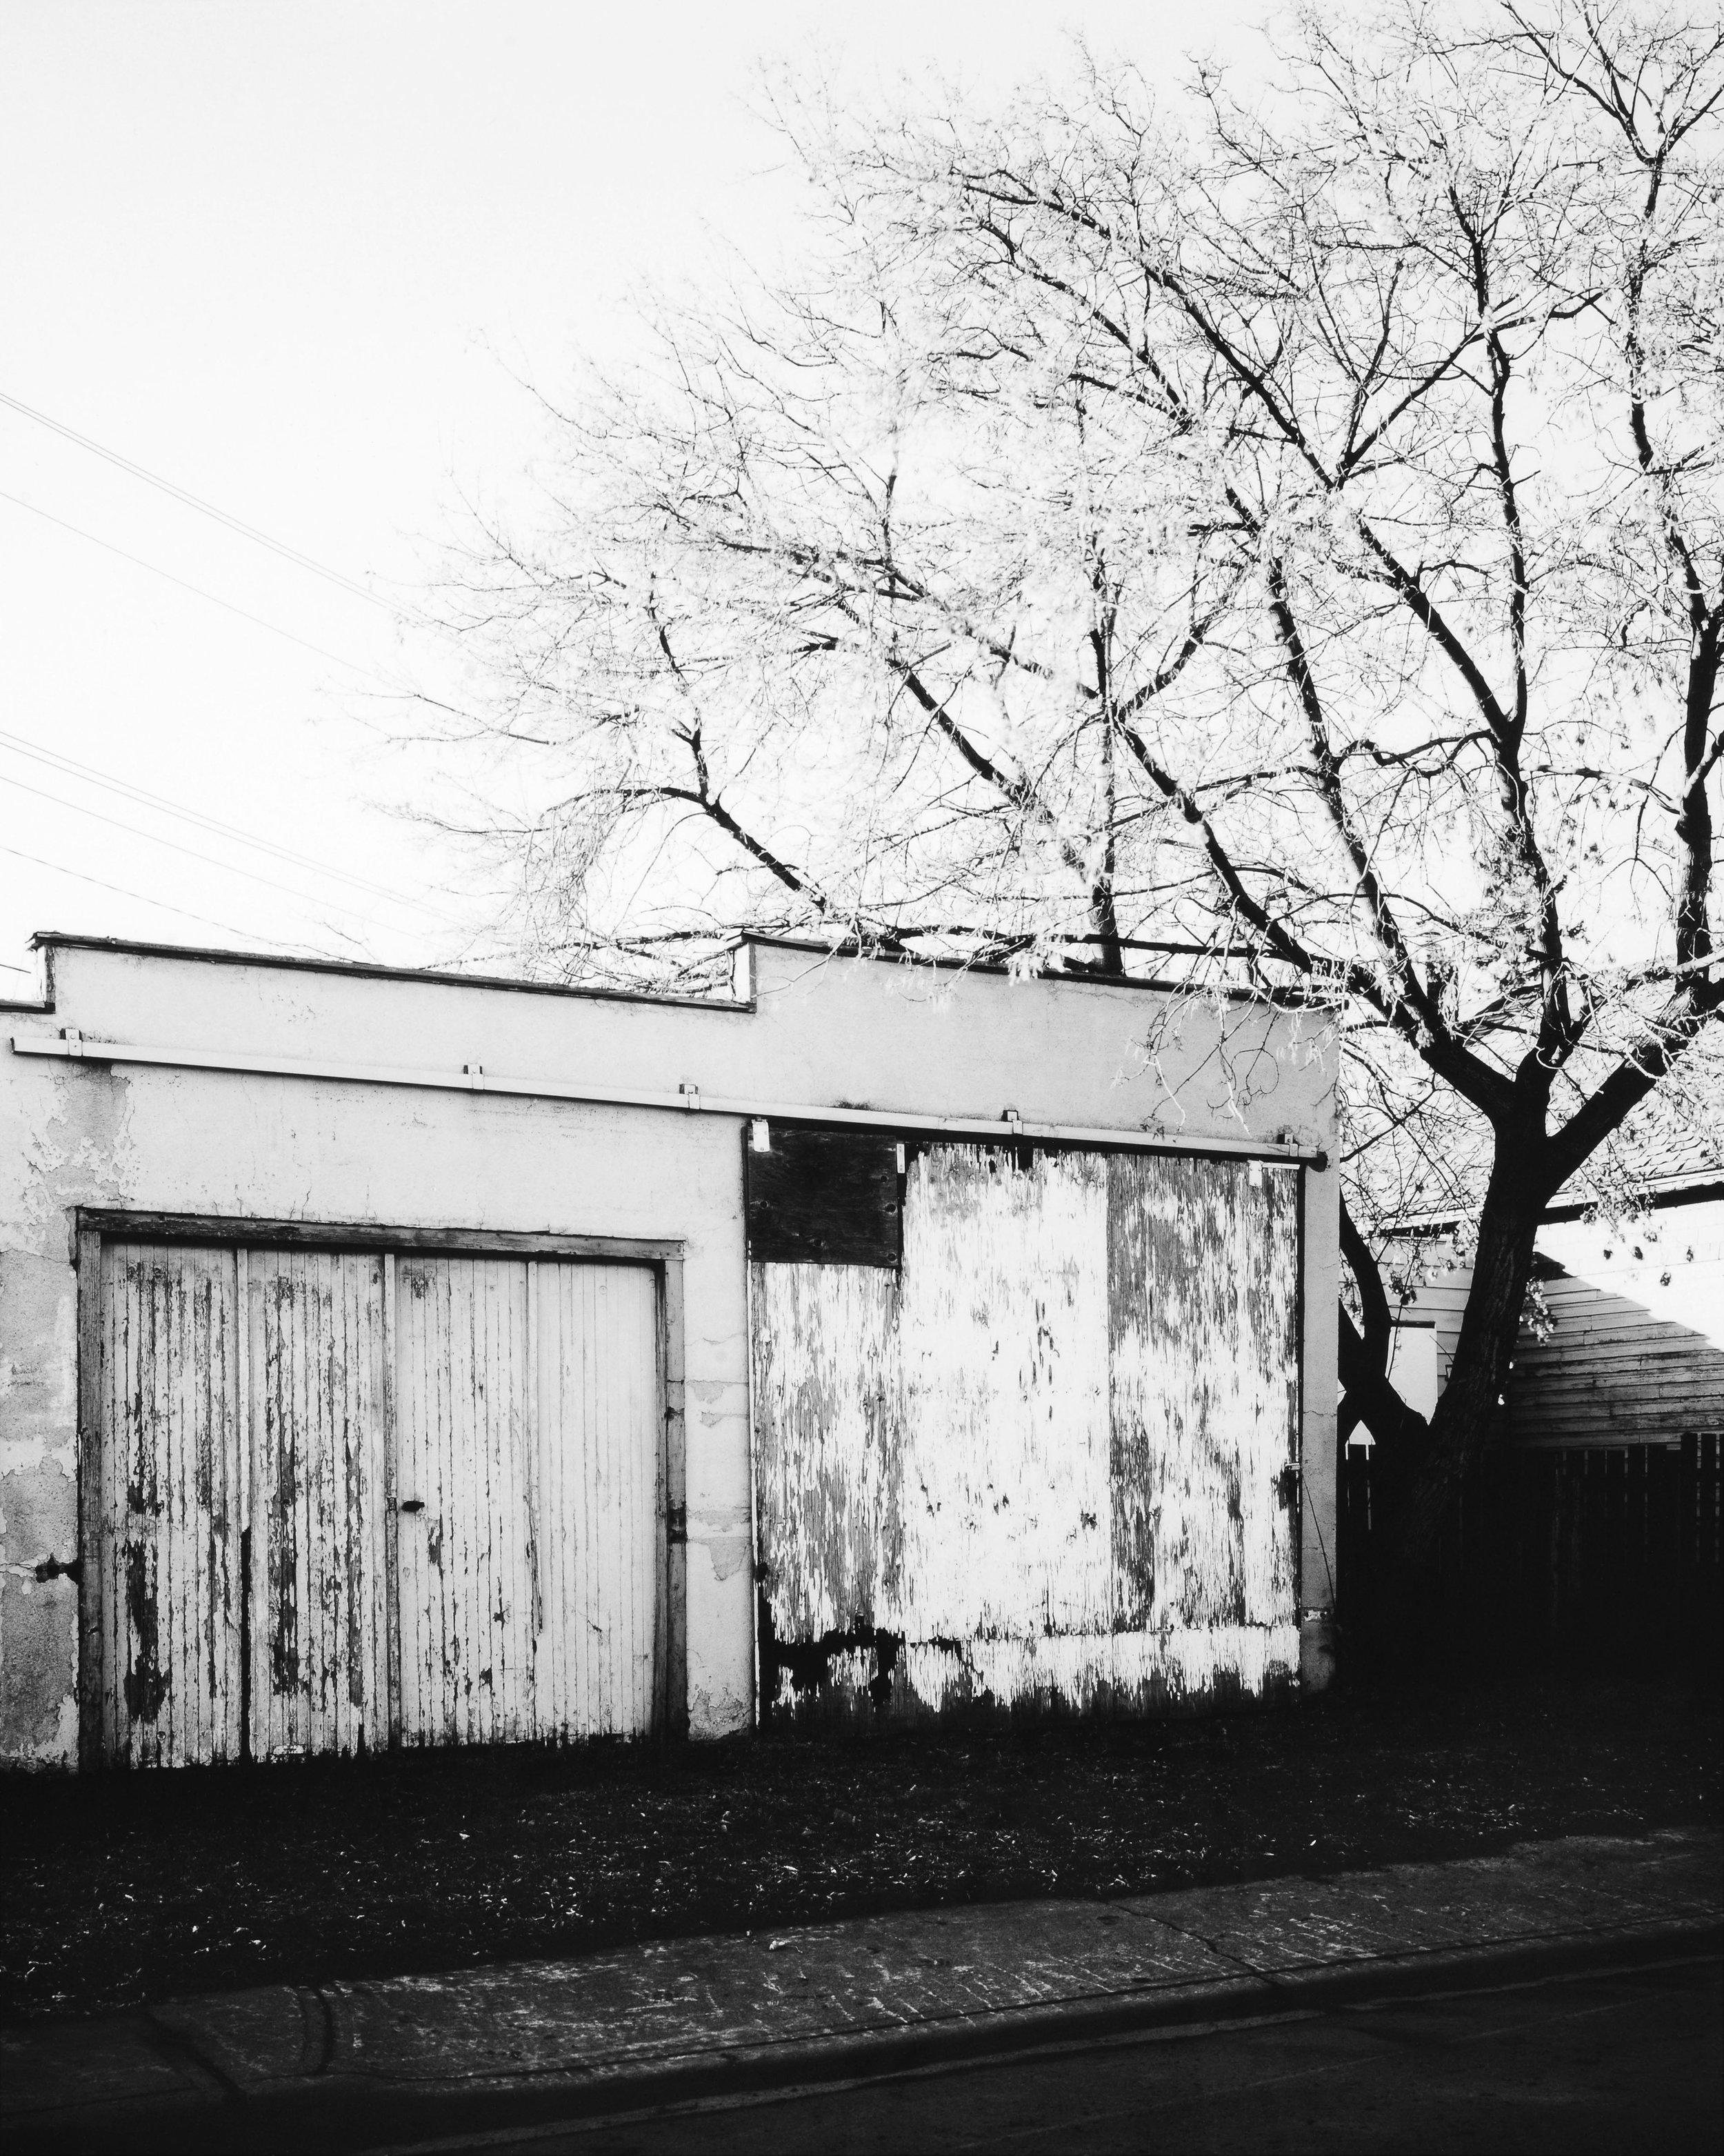 Reproduction - House Four - Print - No Border.jpg